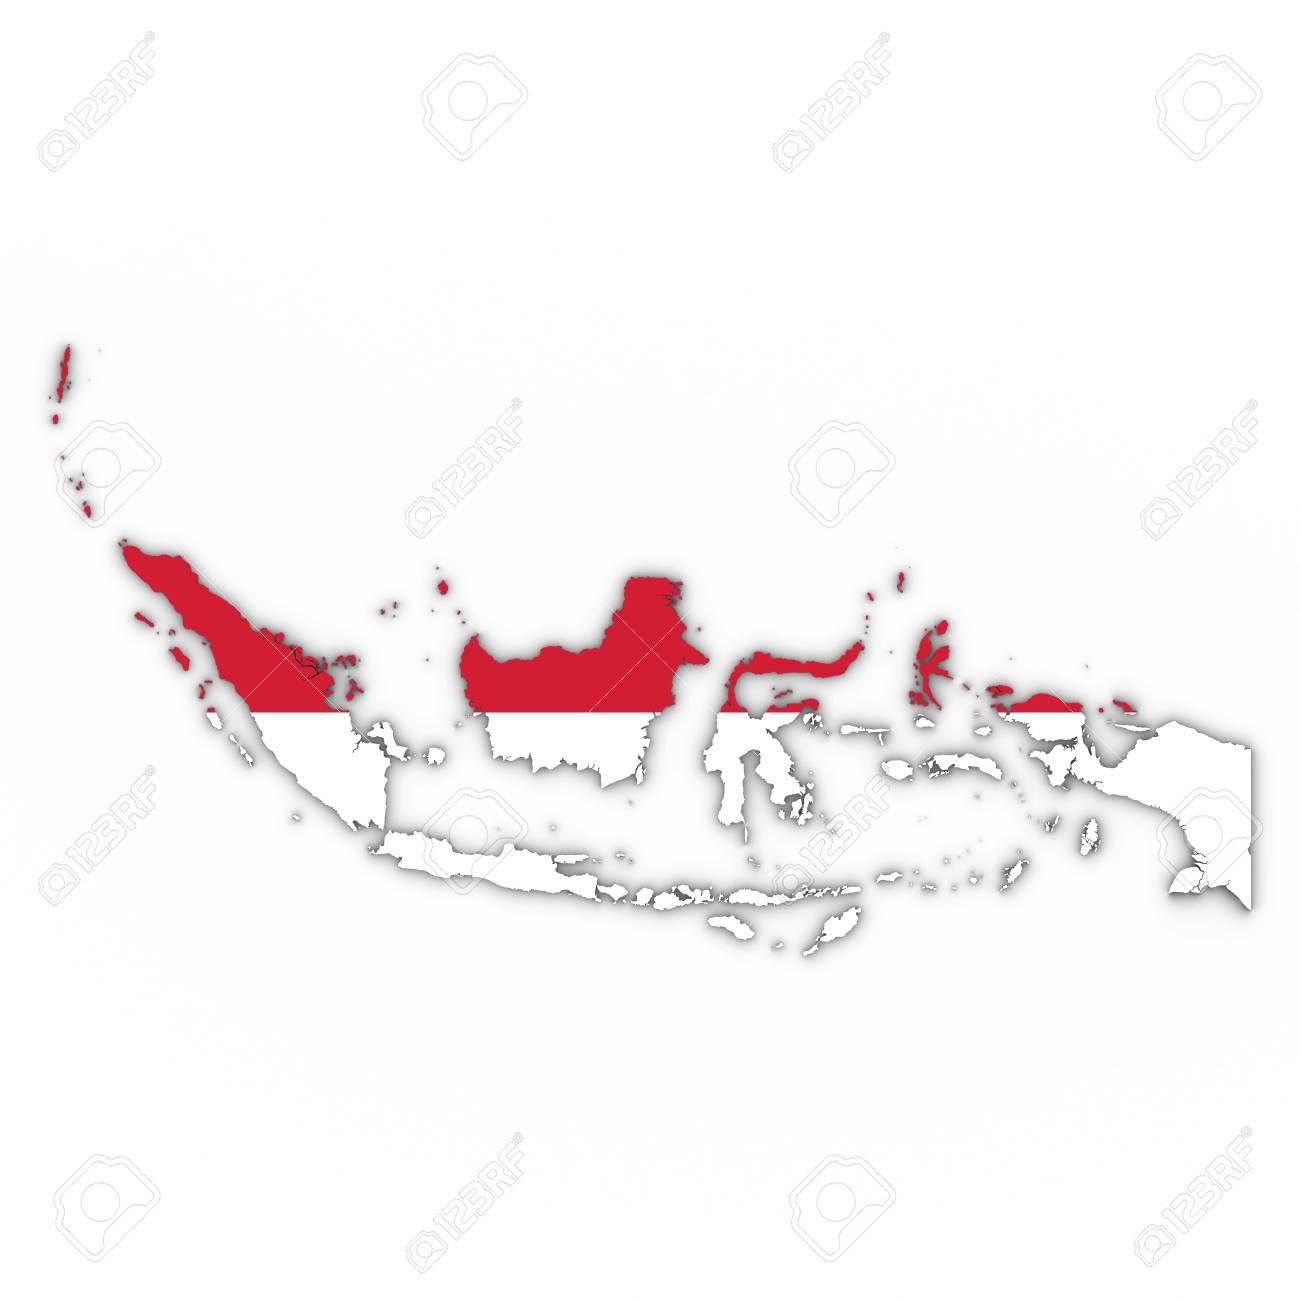 Stock Illustration on acholi map, uygur map, pan european map, quebecois map, biblical greek map, maluku island indonesia map, chichewa map, gaulish map, valencian map, sri lankan map, sumatra map, world map, jakarta indonesia map, serb map, india map, haiti map, bangladesh map, java map, zande map, inuit cultures map,